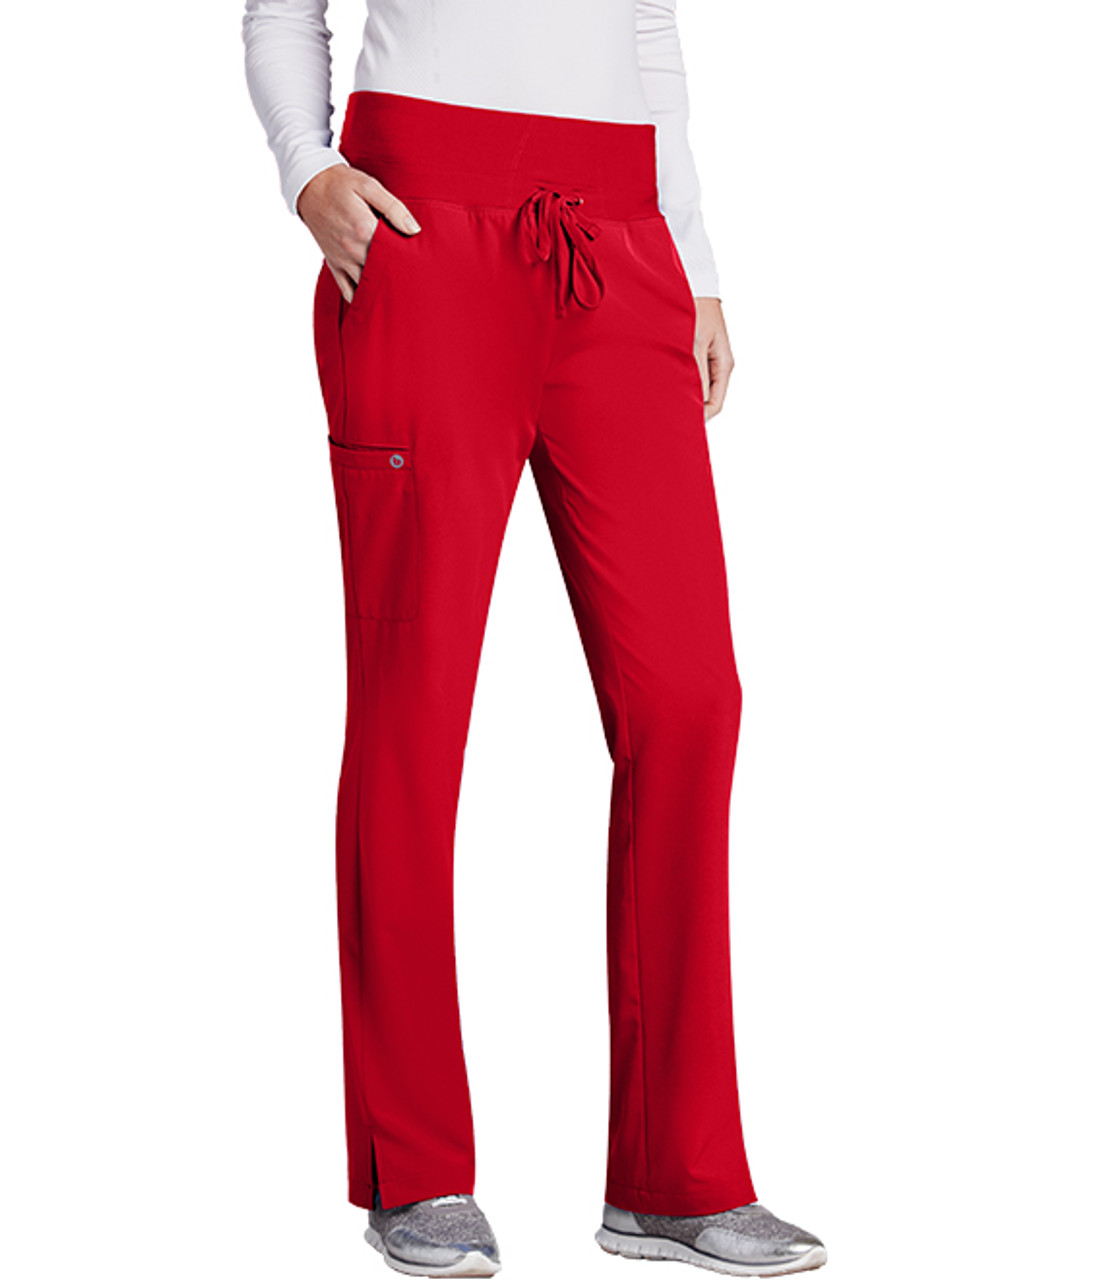 (5206) Barco One Knit Waistband 5 Pocket Scrub Pant